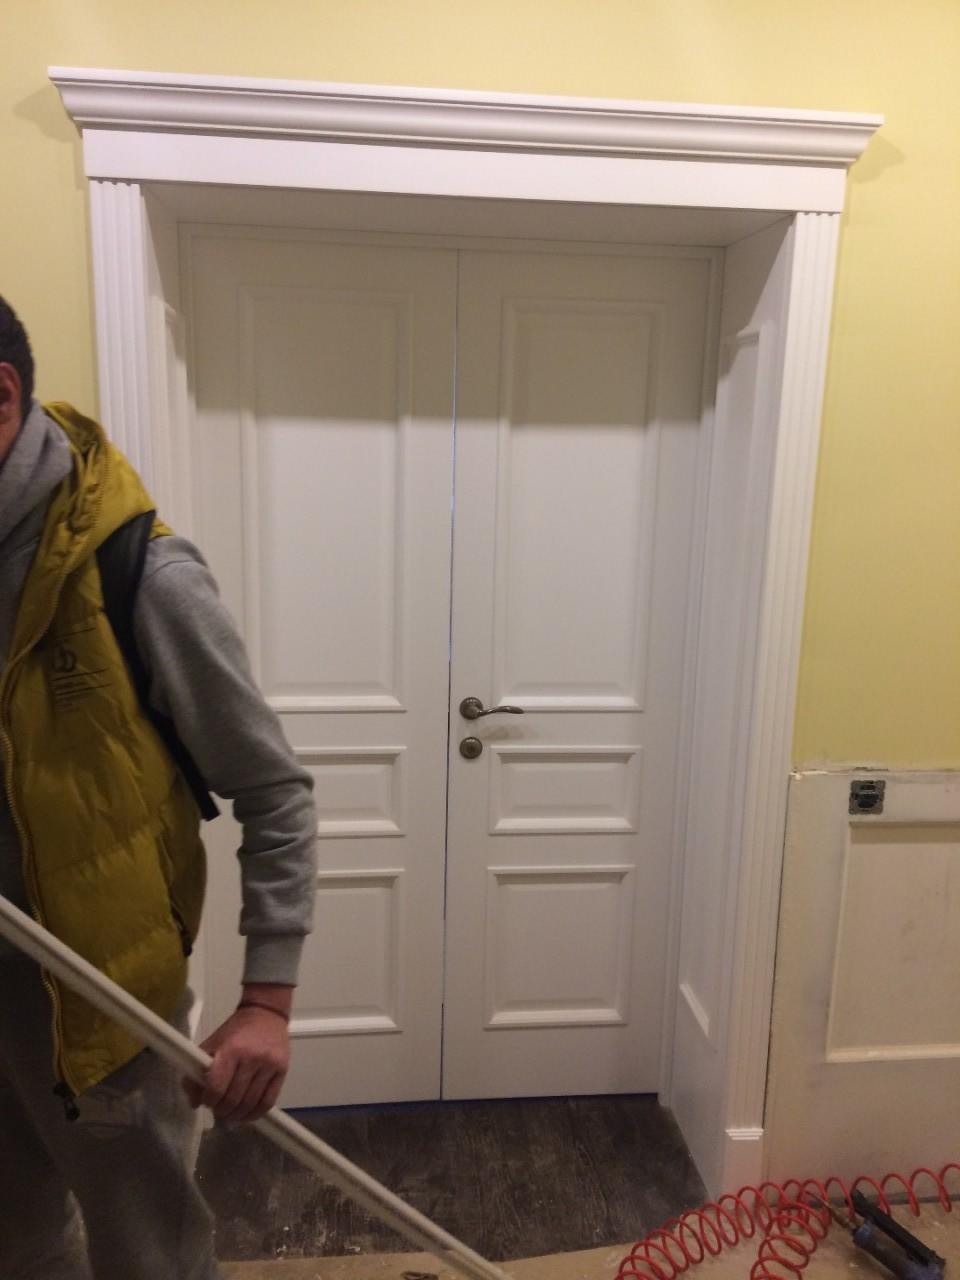 цены на монтаж входных дверей